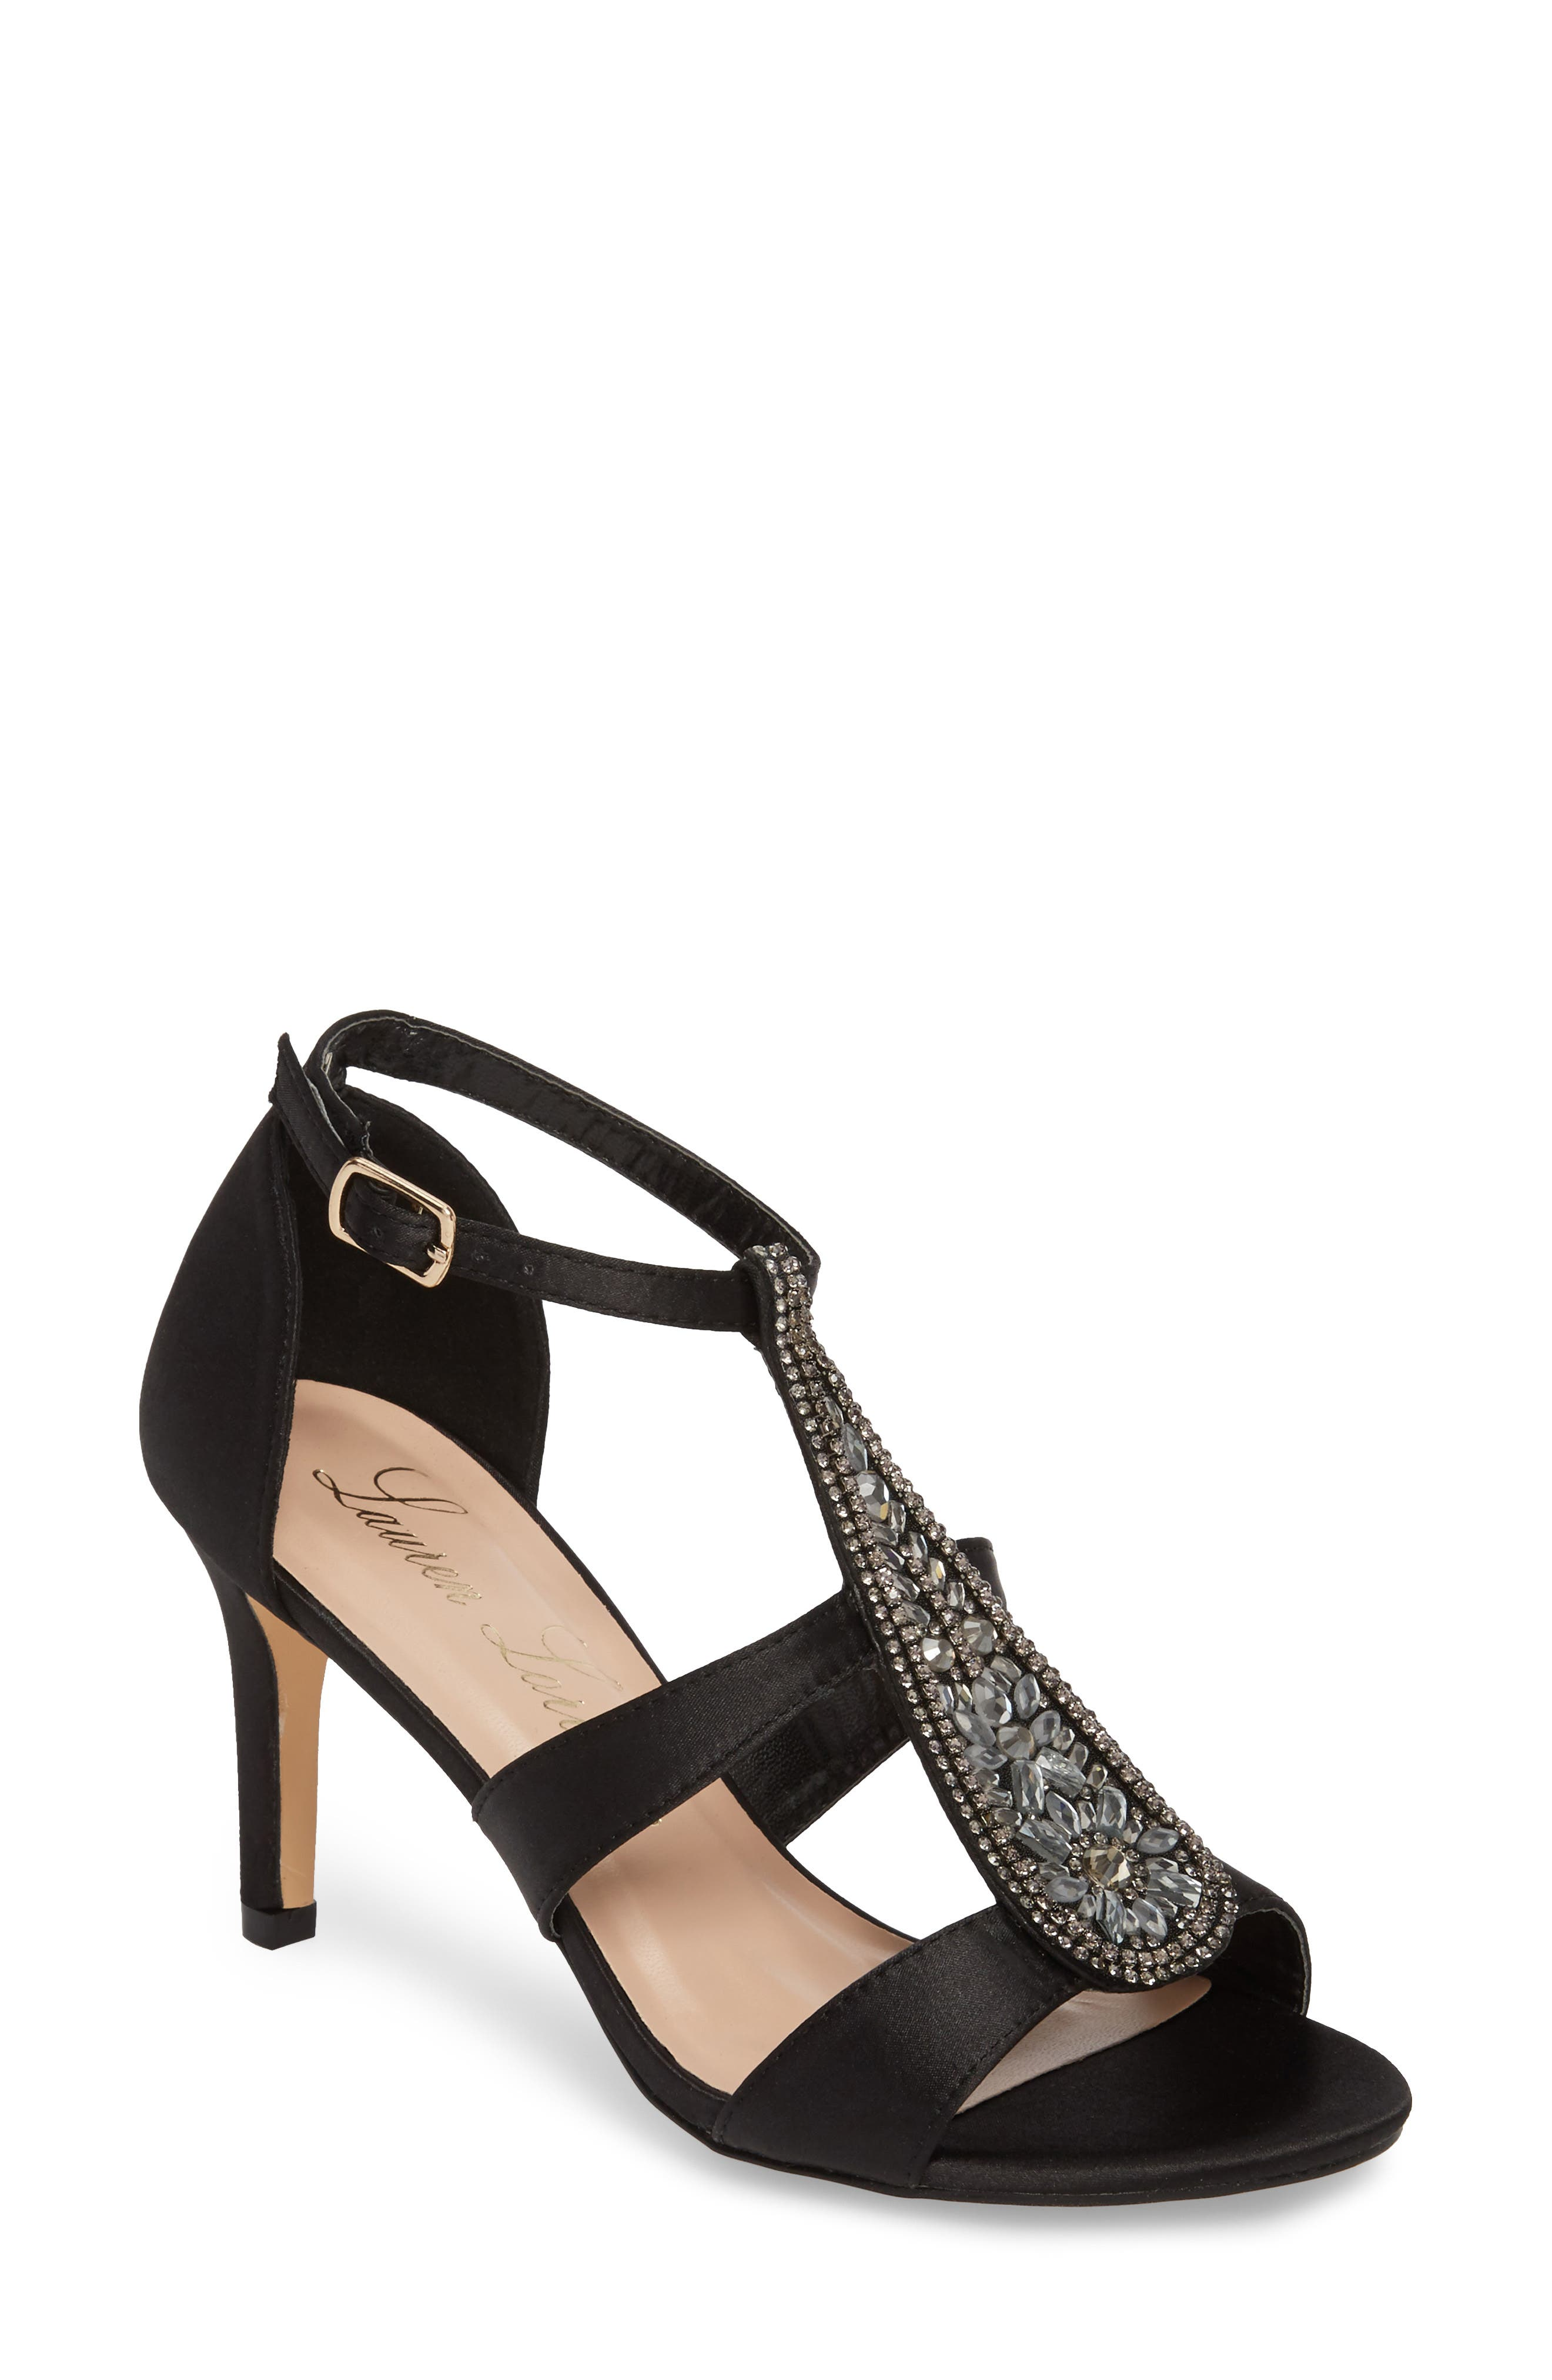 Lauren Lorraine Ritz Crystal Embellished Sandal